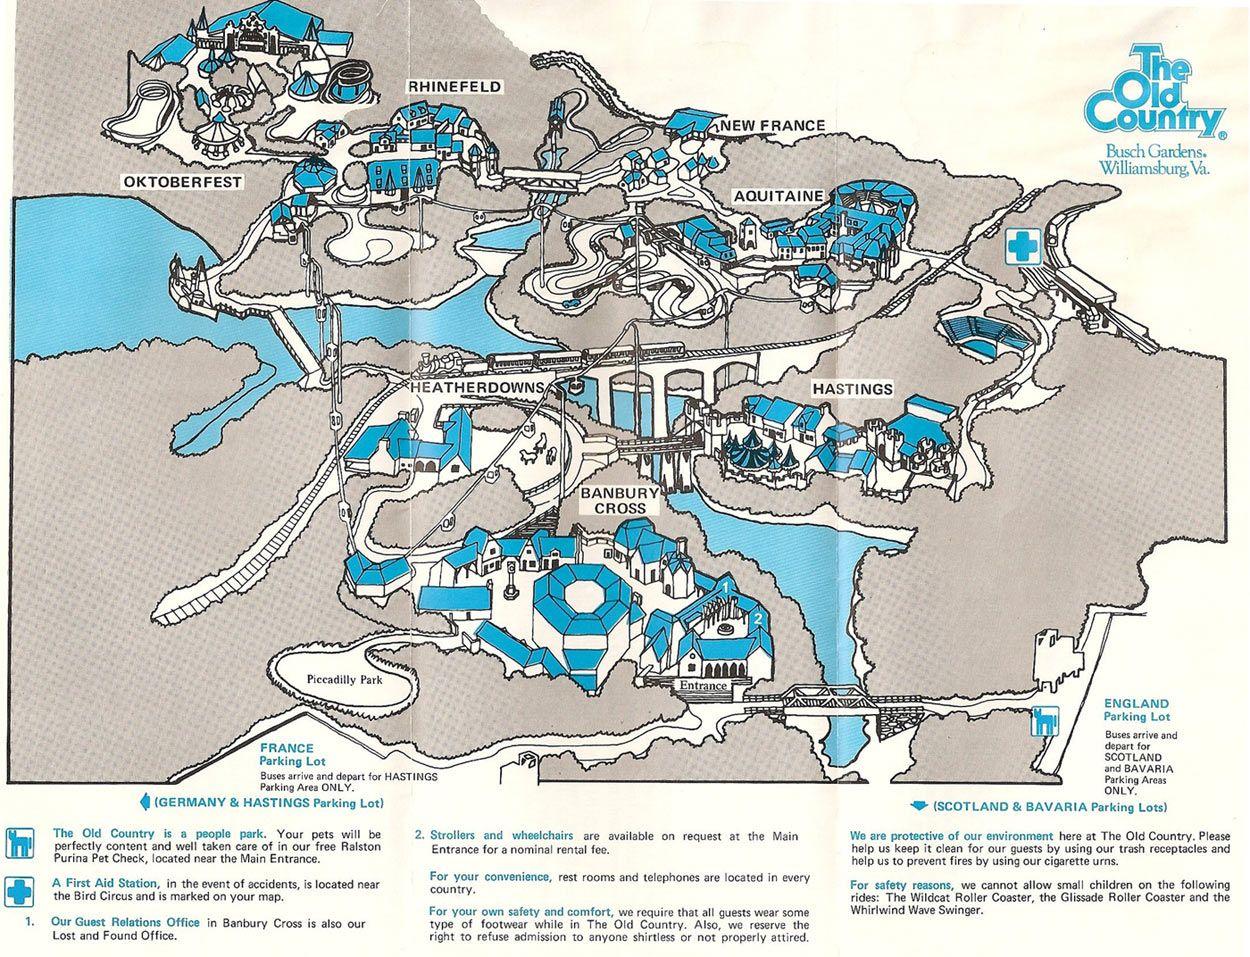 Busch Gardens The Old Country Theme Park Maps - Bush gardens park map